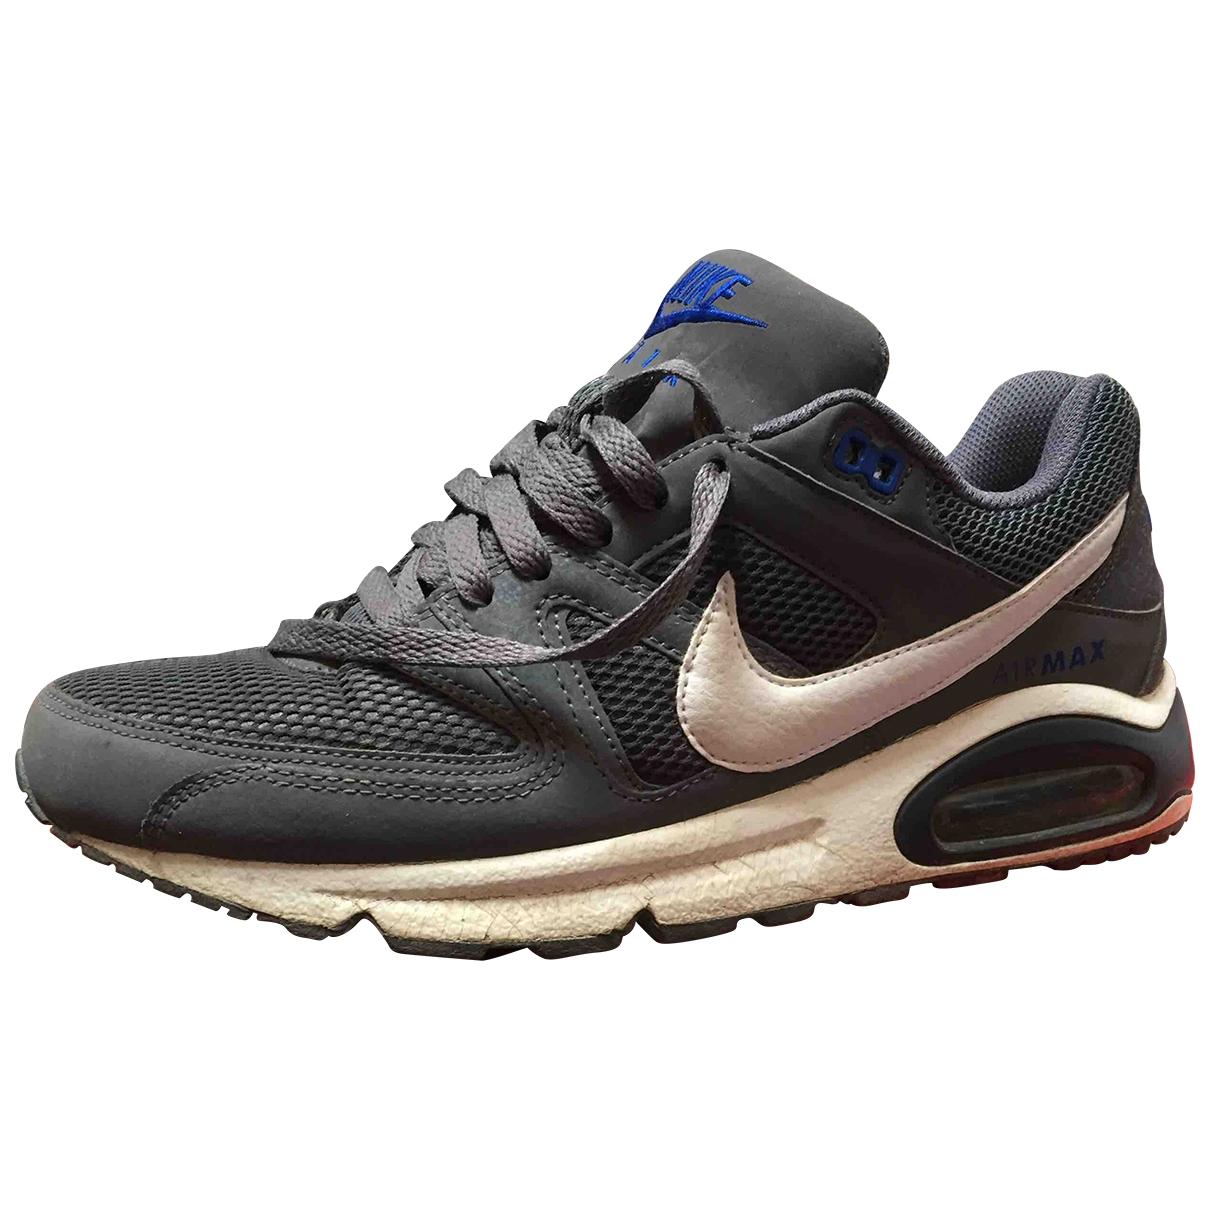 Nike Air Max  Grey Cloth Trainers for Women 40 EU